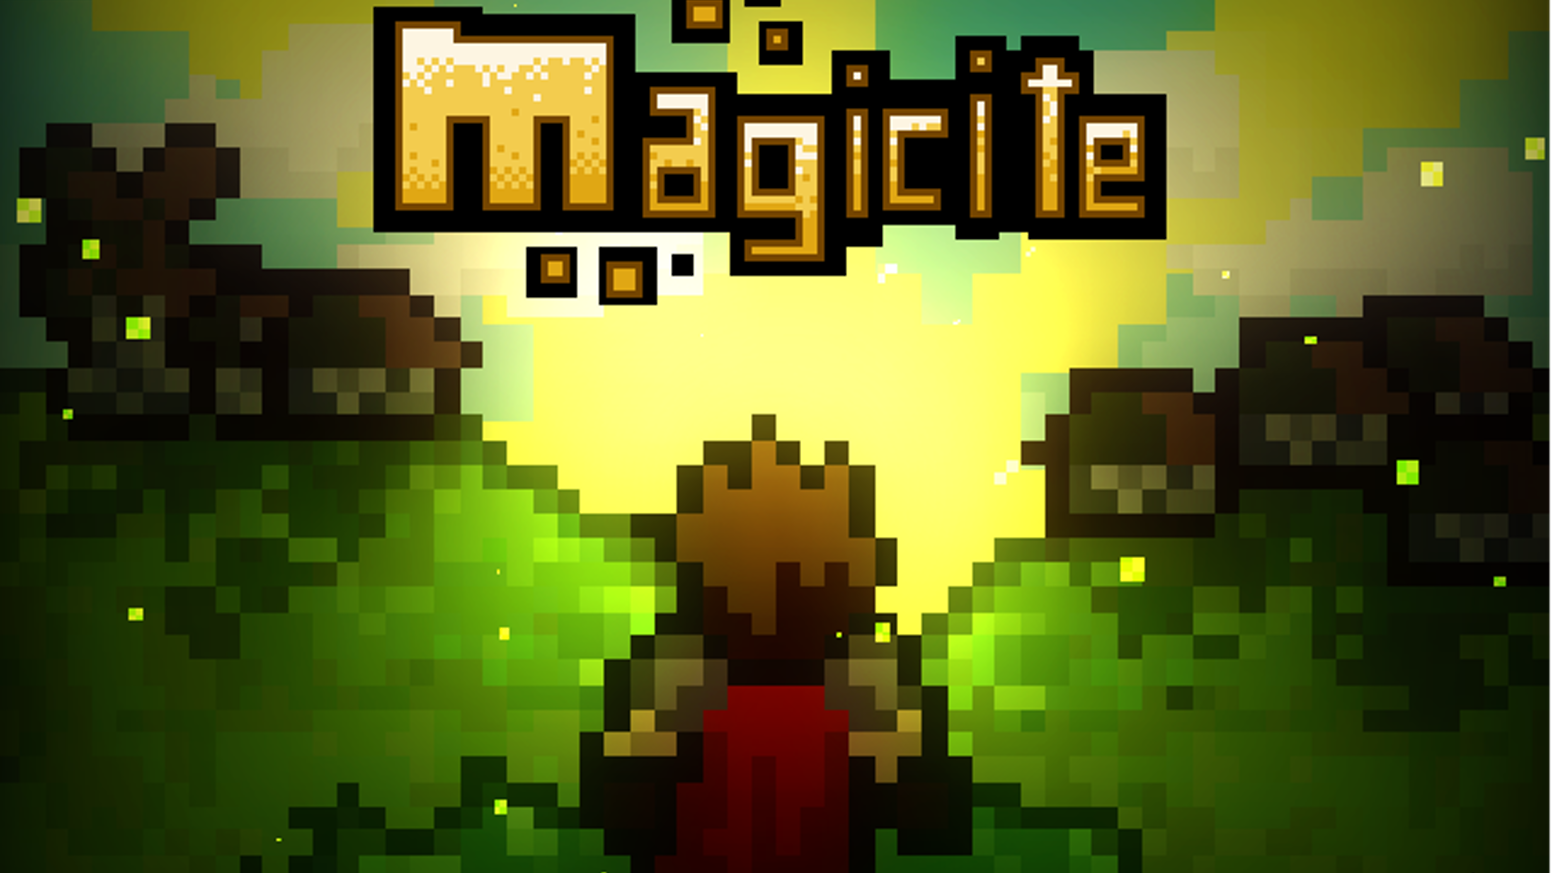 Magicite - A Multiplayer RPG Platformer by Sean Young — Kickstarter